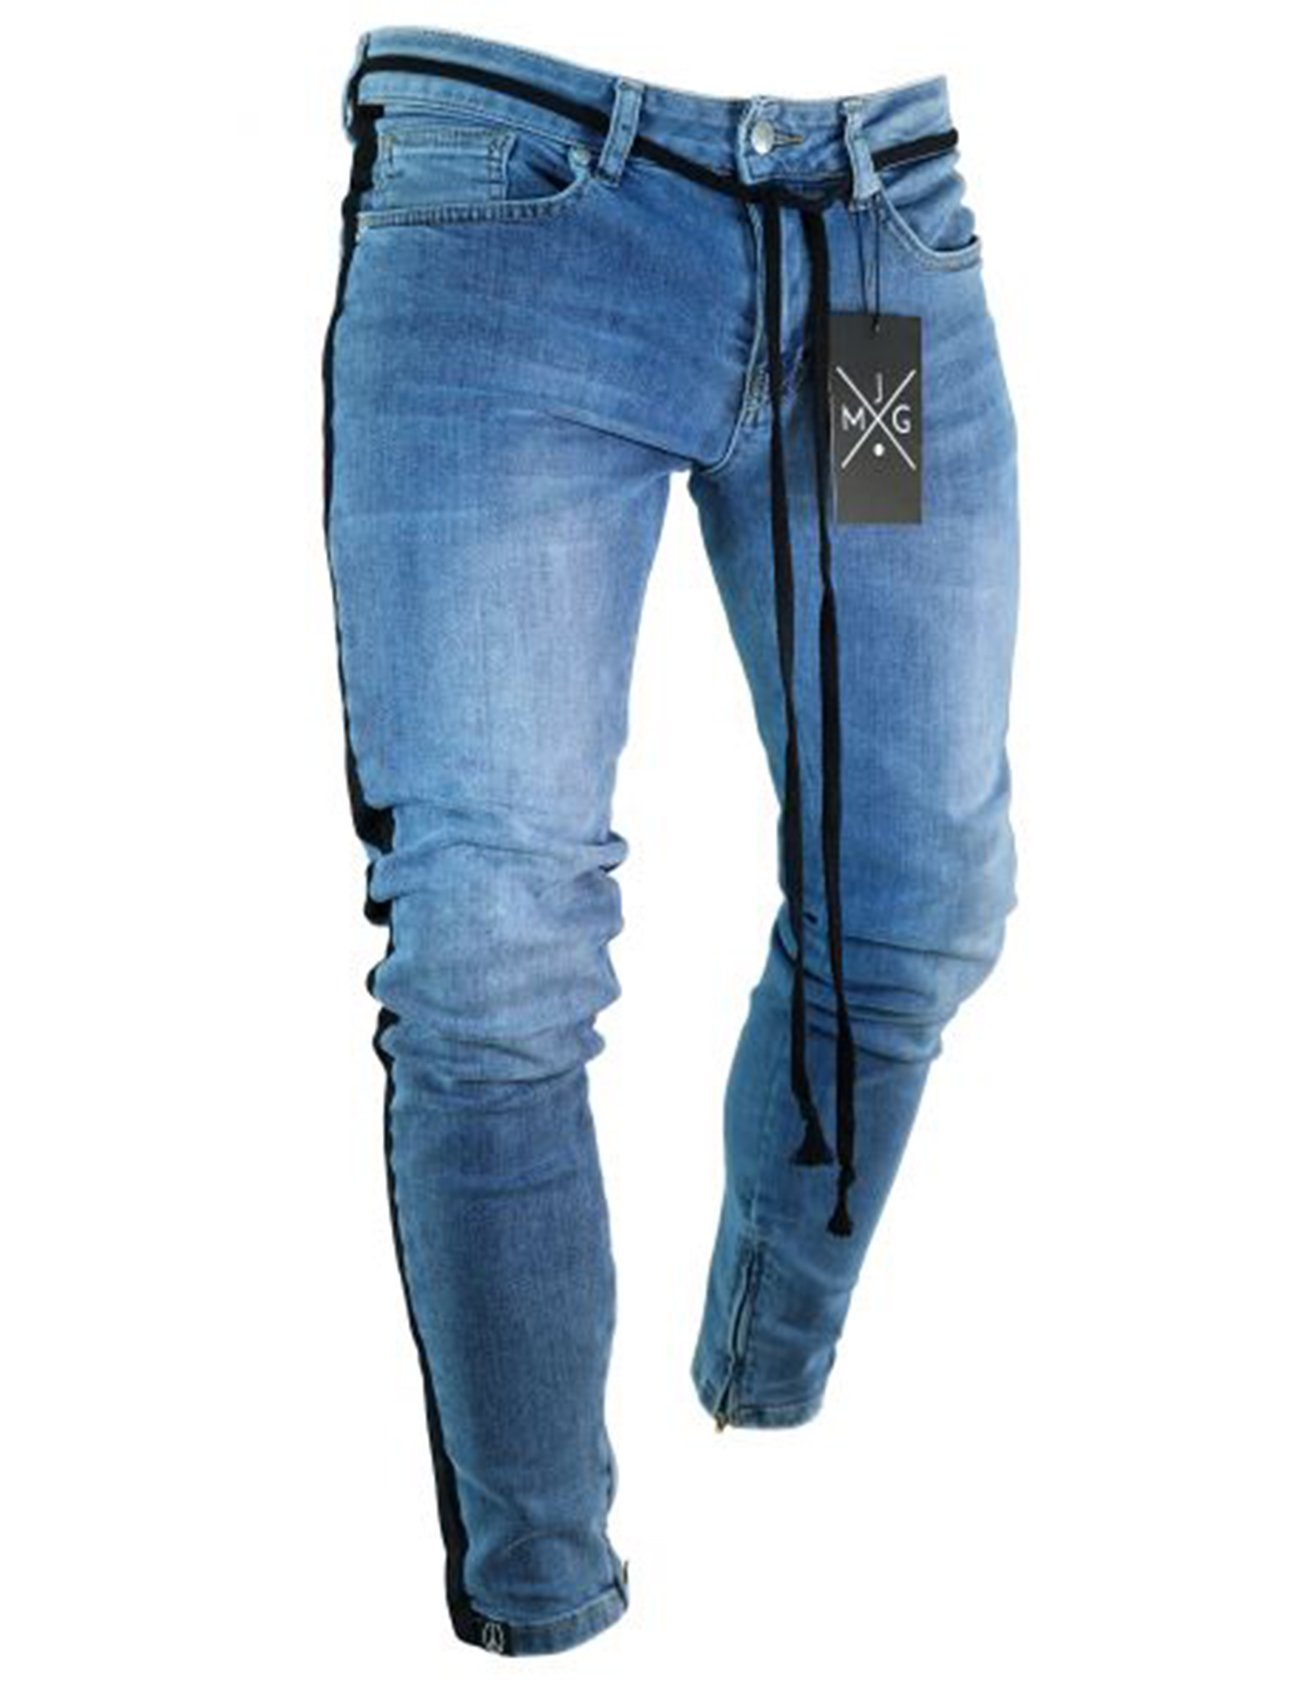 Bestgift Men's Stretch Side Stripe Washed Jeans XS Dark Blue